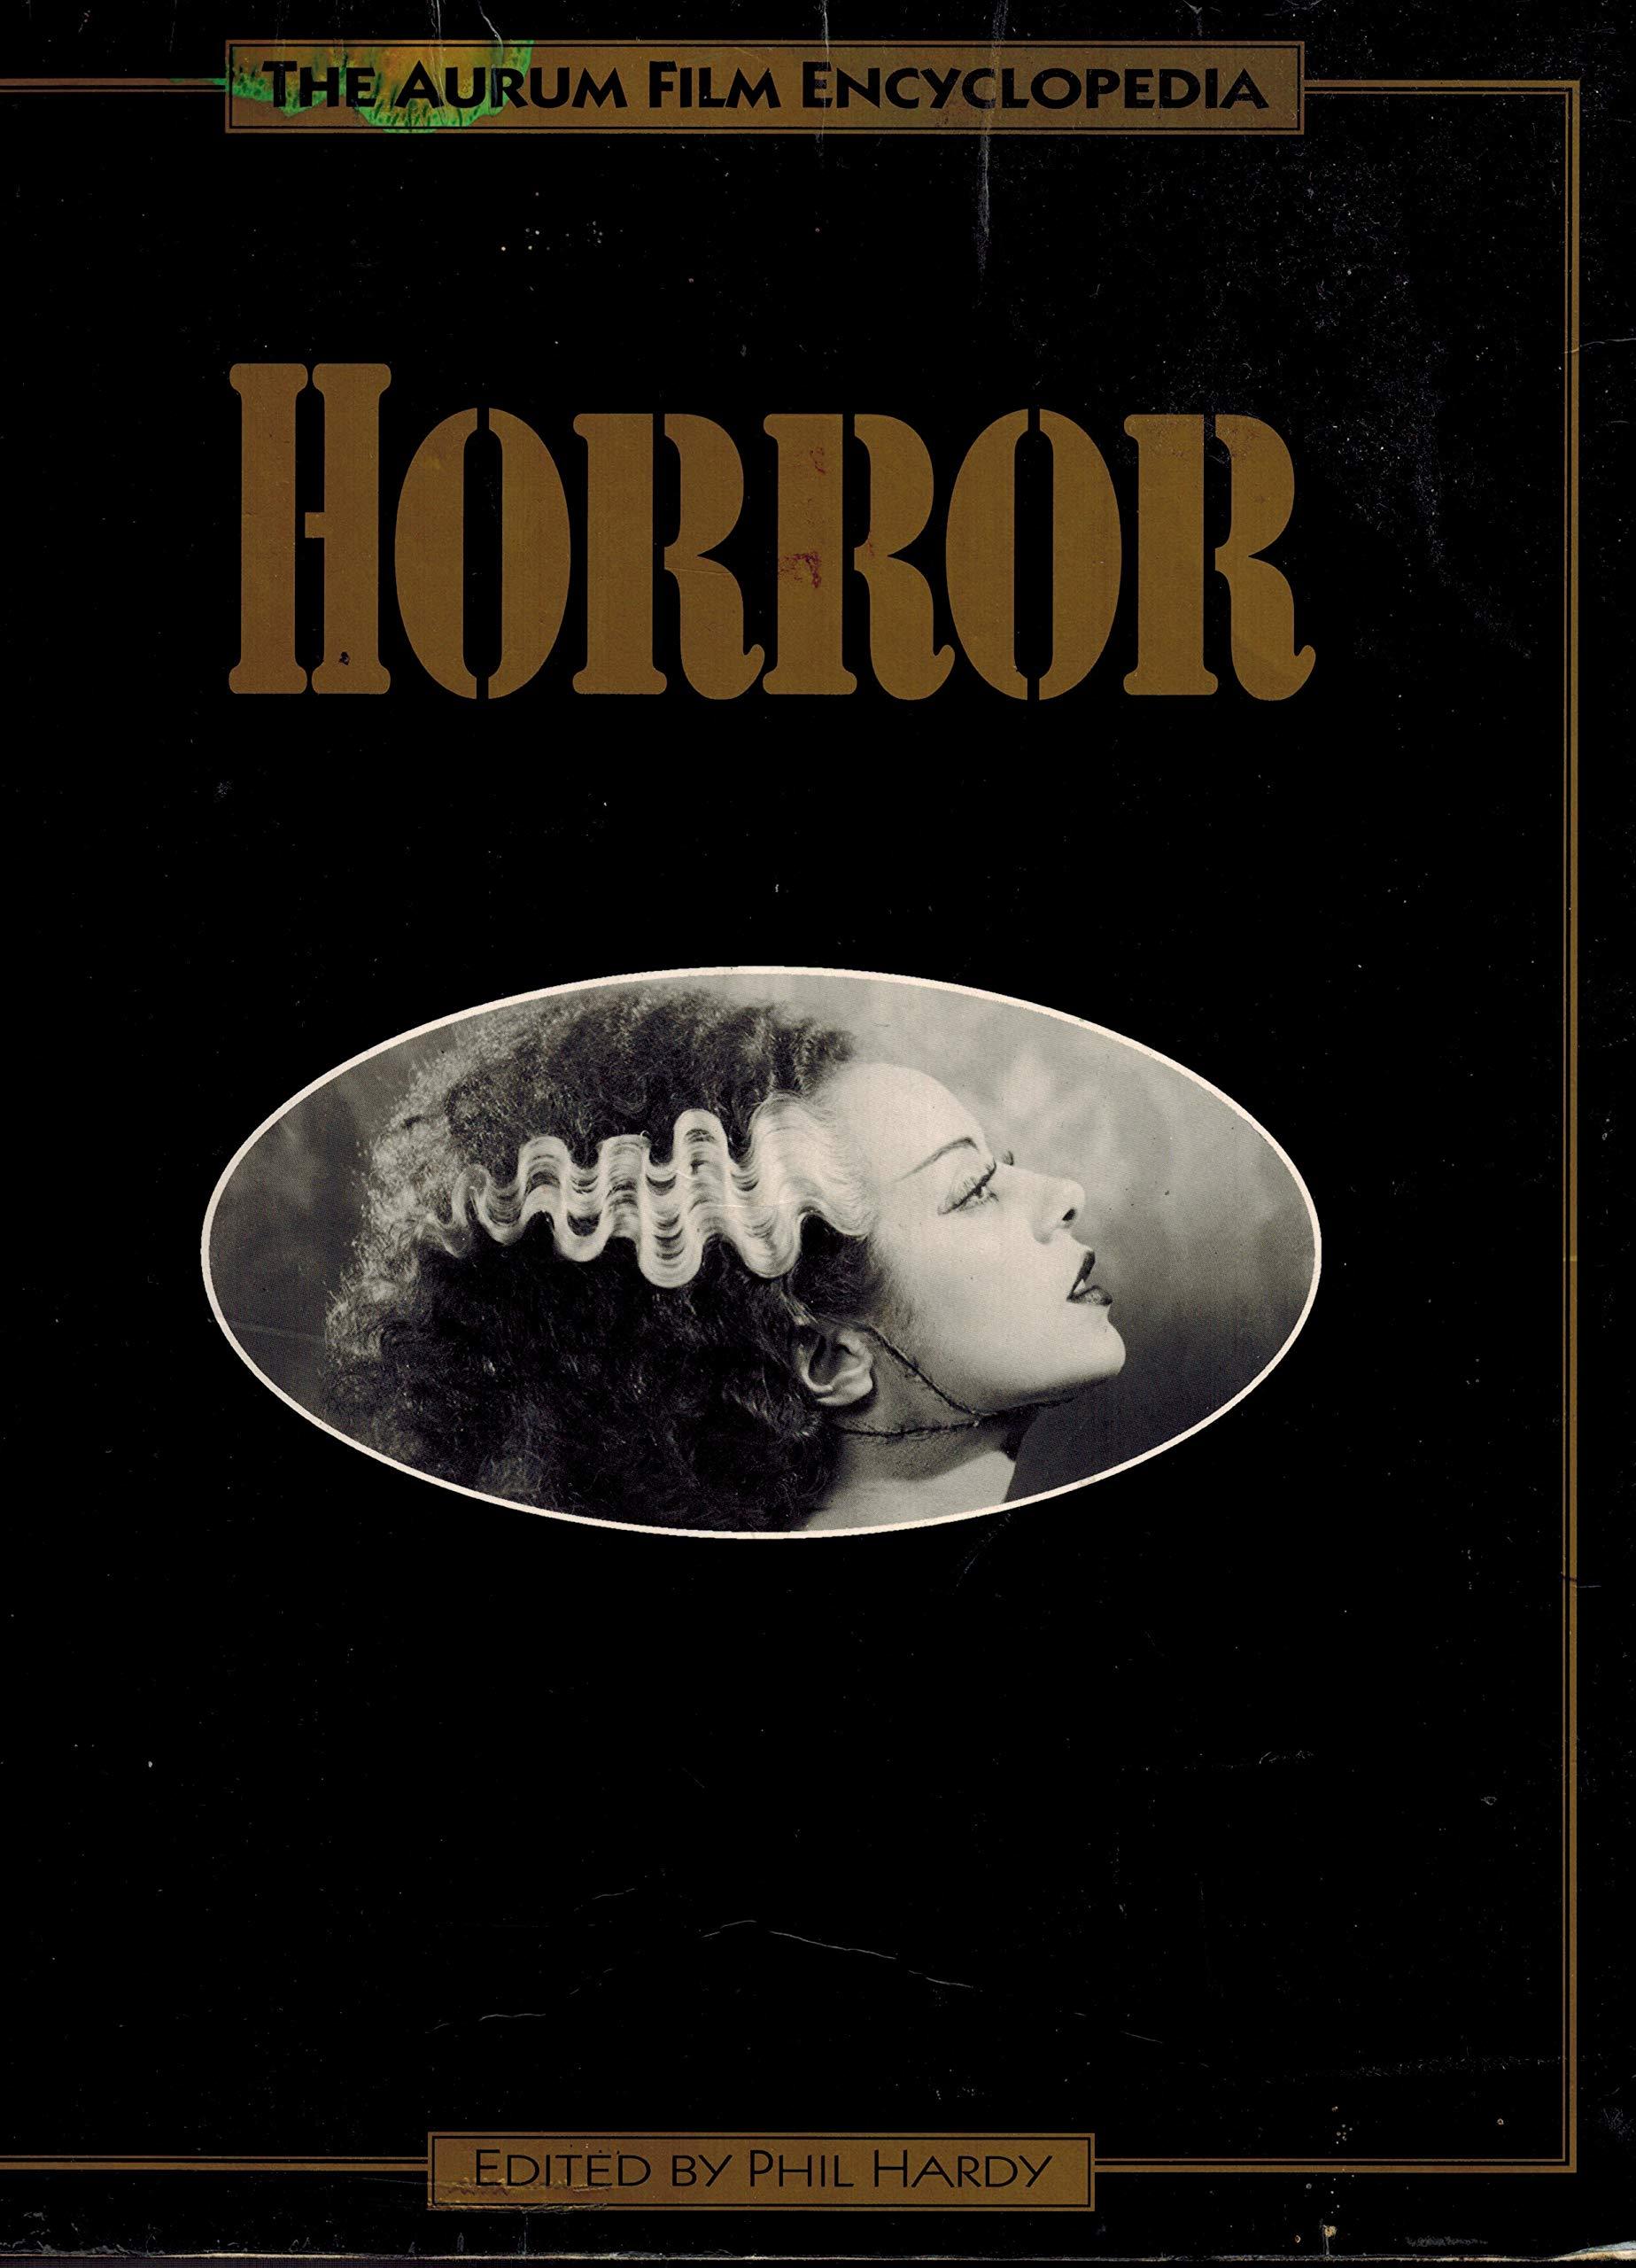 horror aurum film encyclopaedia